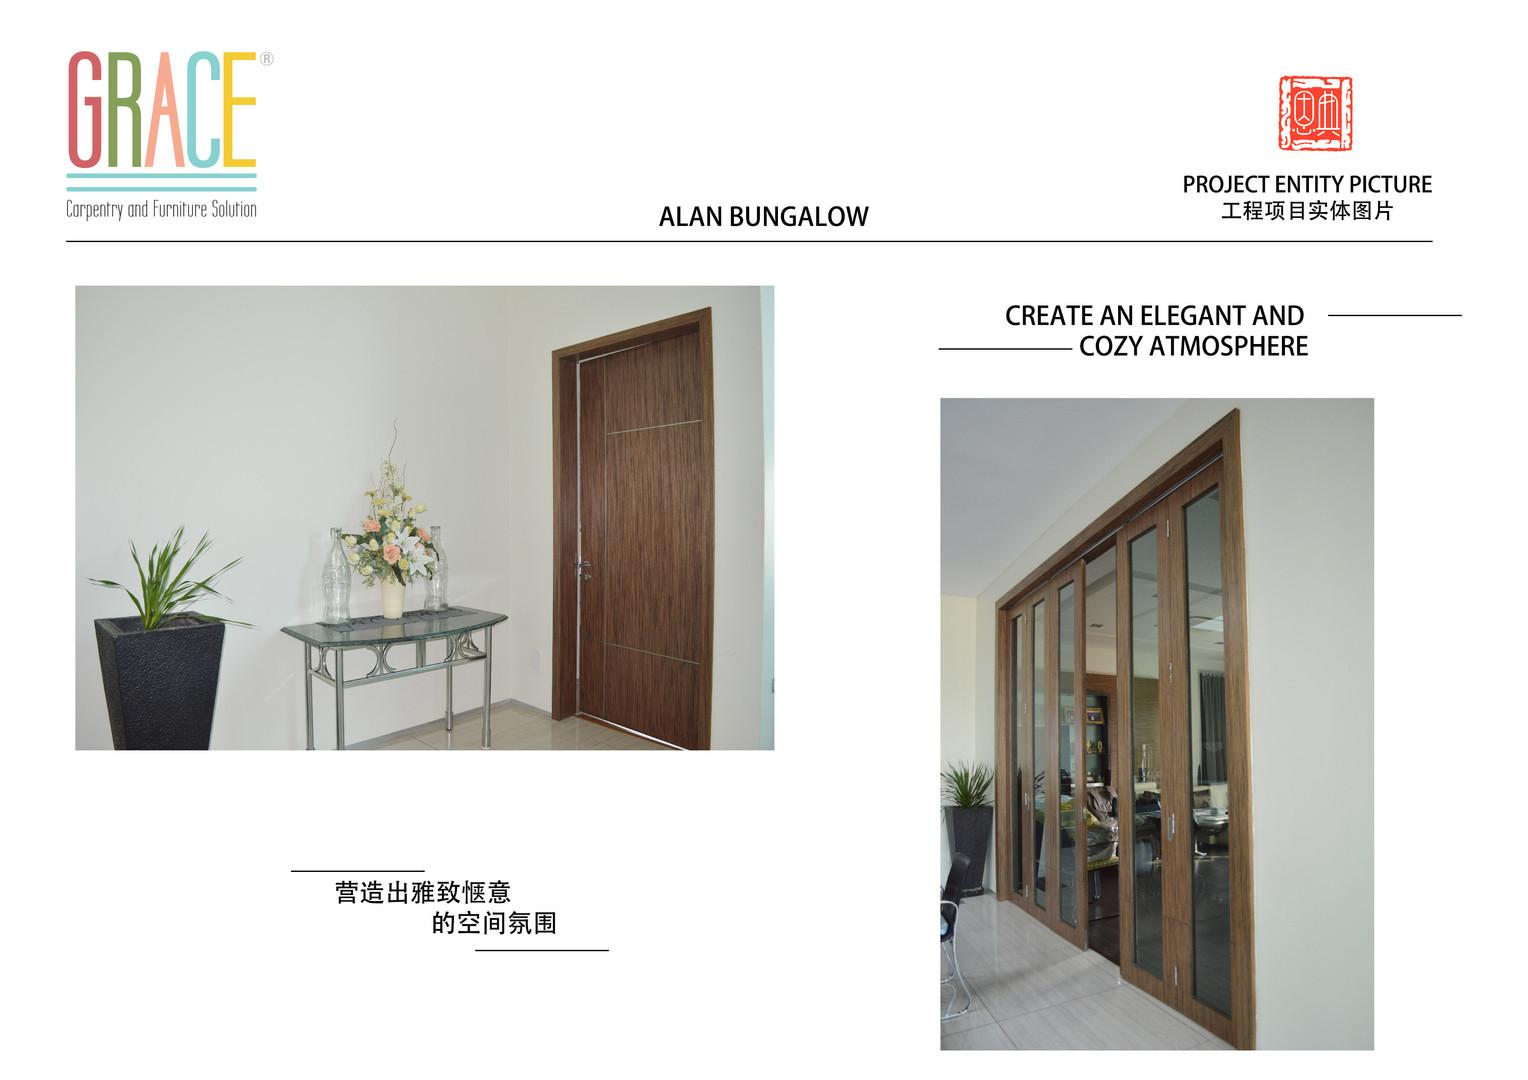 Bungalow design and build